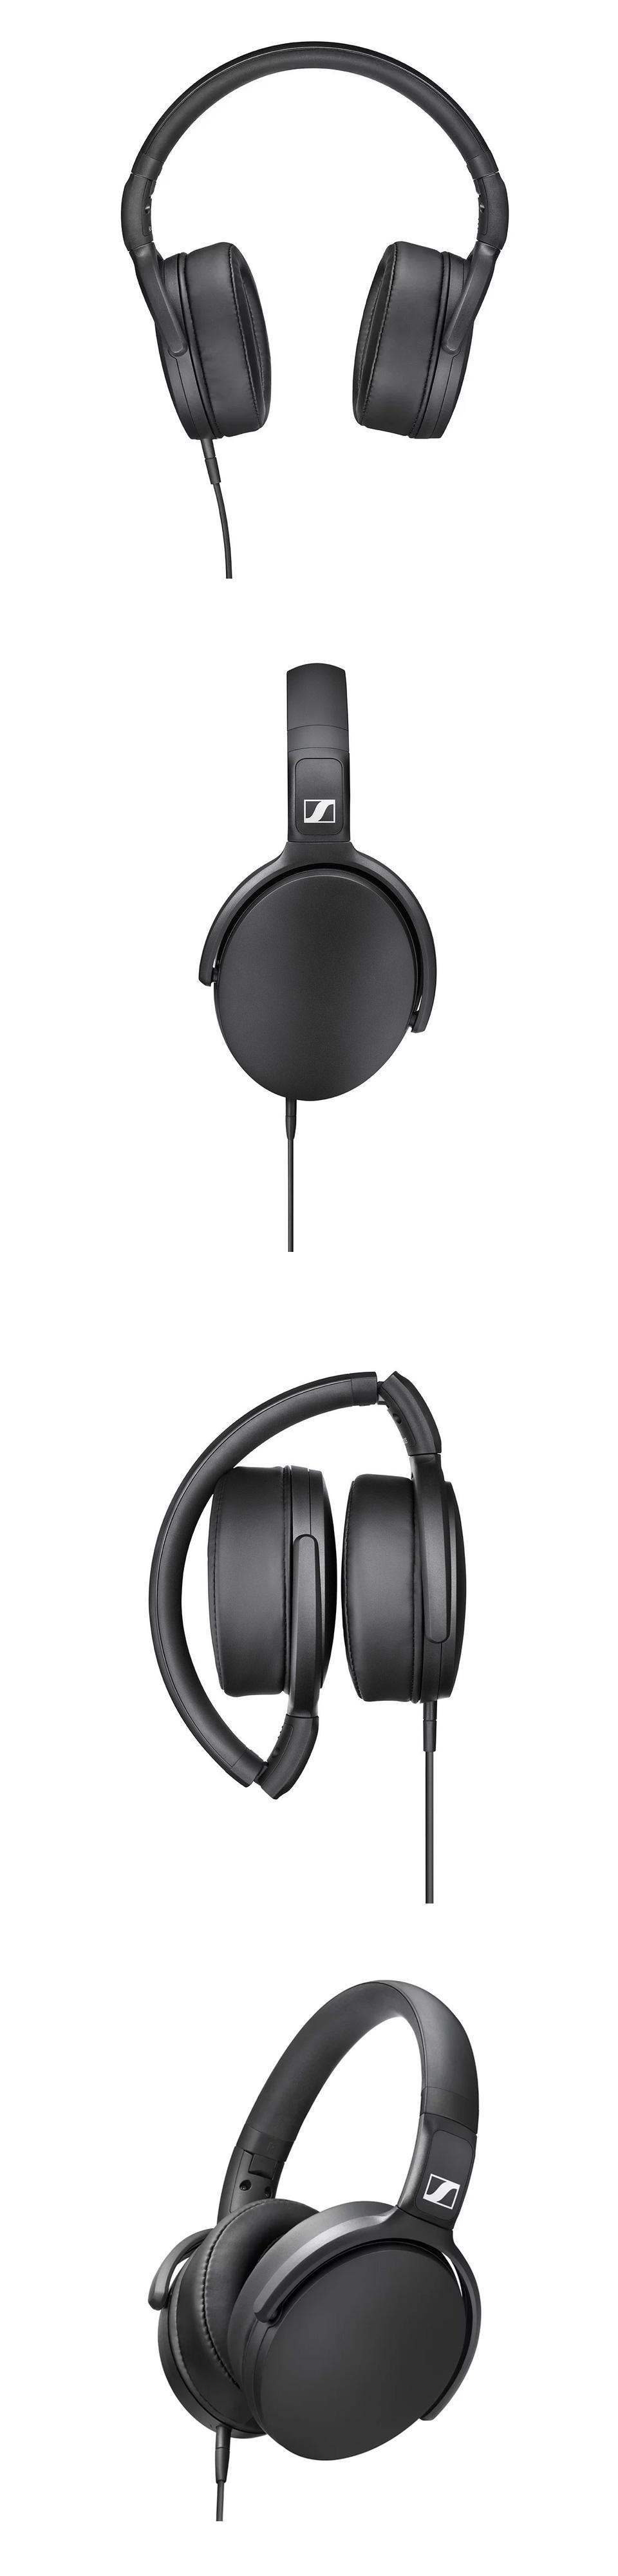 Sennheiser HD 400S Over Ear Headphones with Mic product